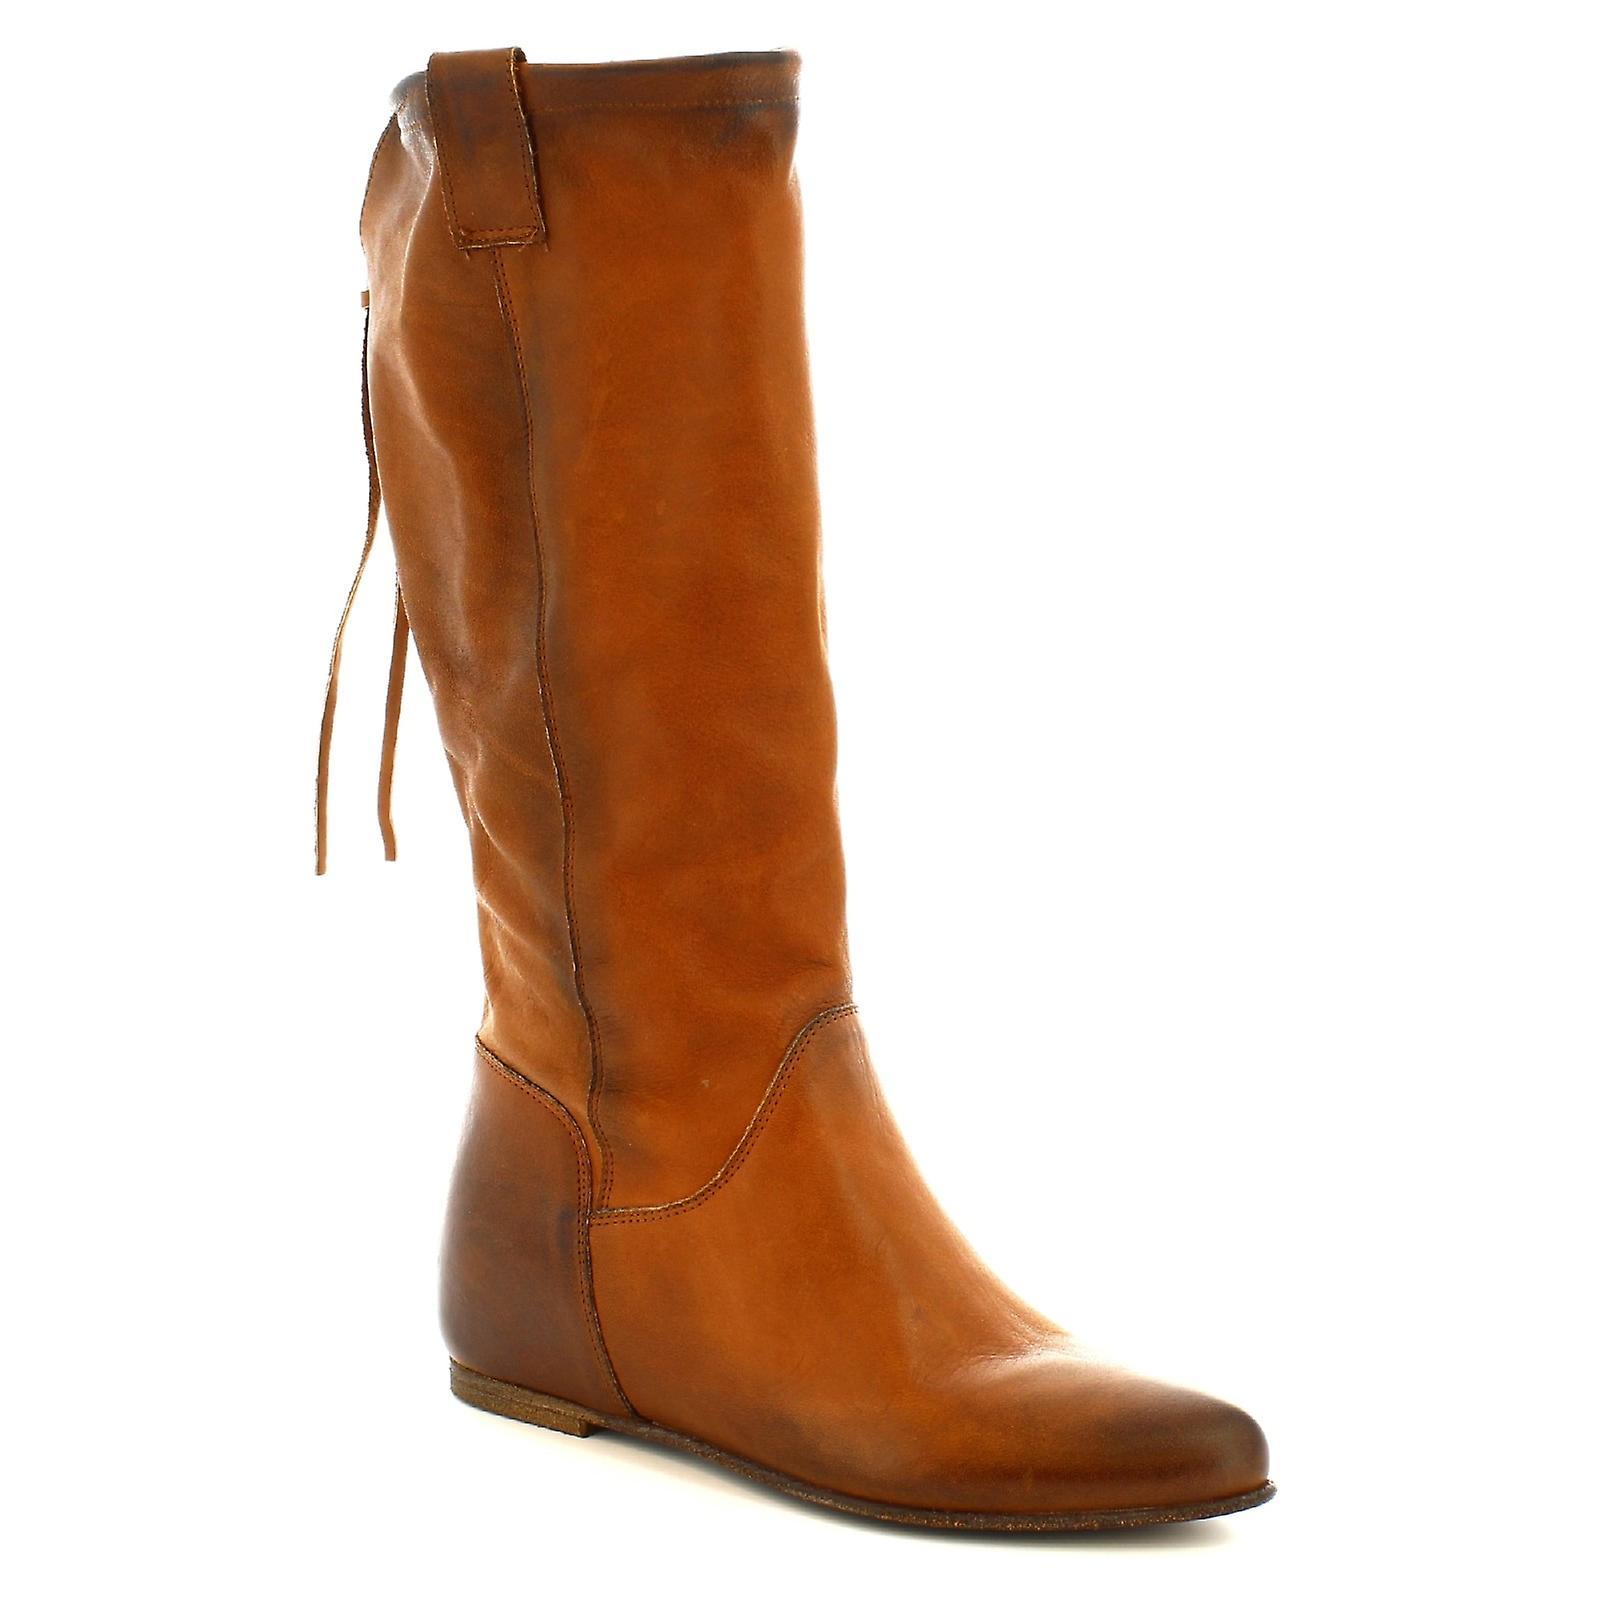 Leonardo Shoes Women's handmade boots inside platform in tan calf leather NVBTZ